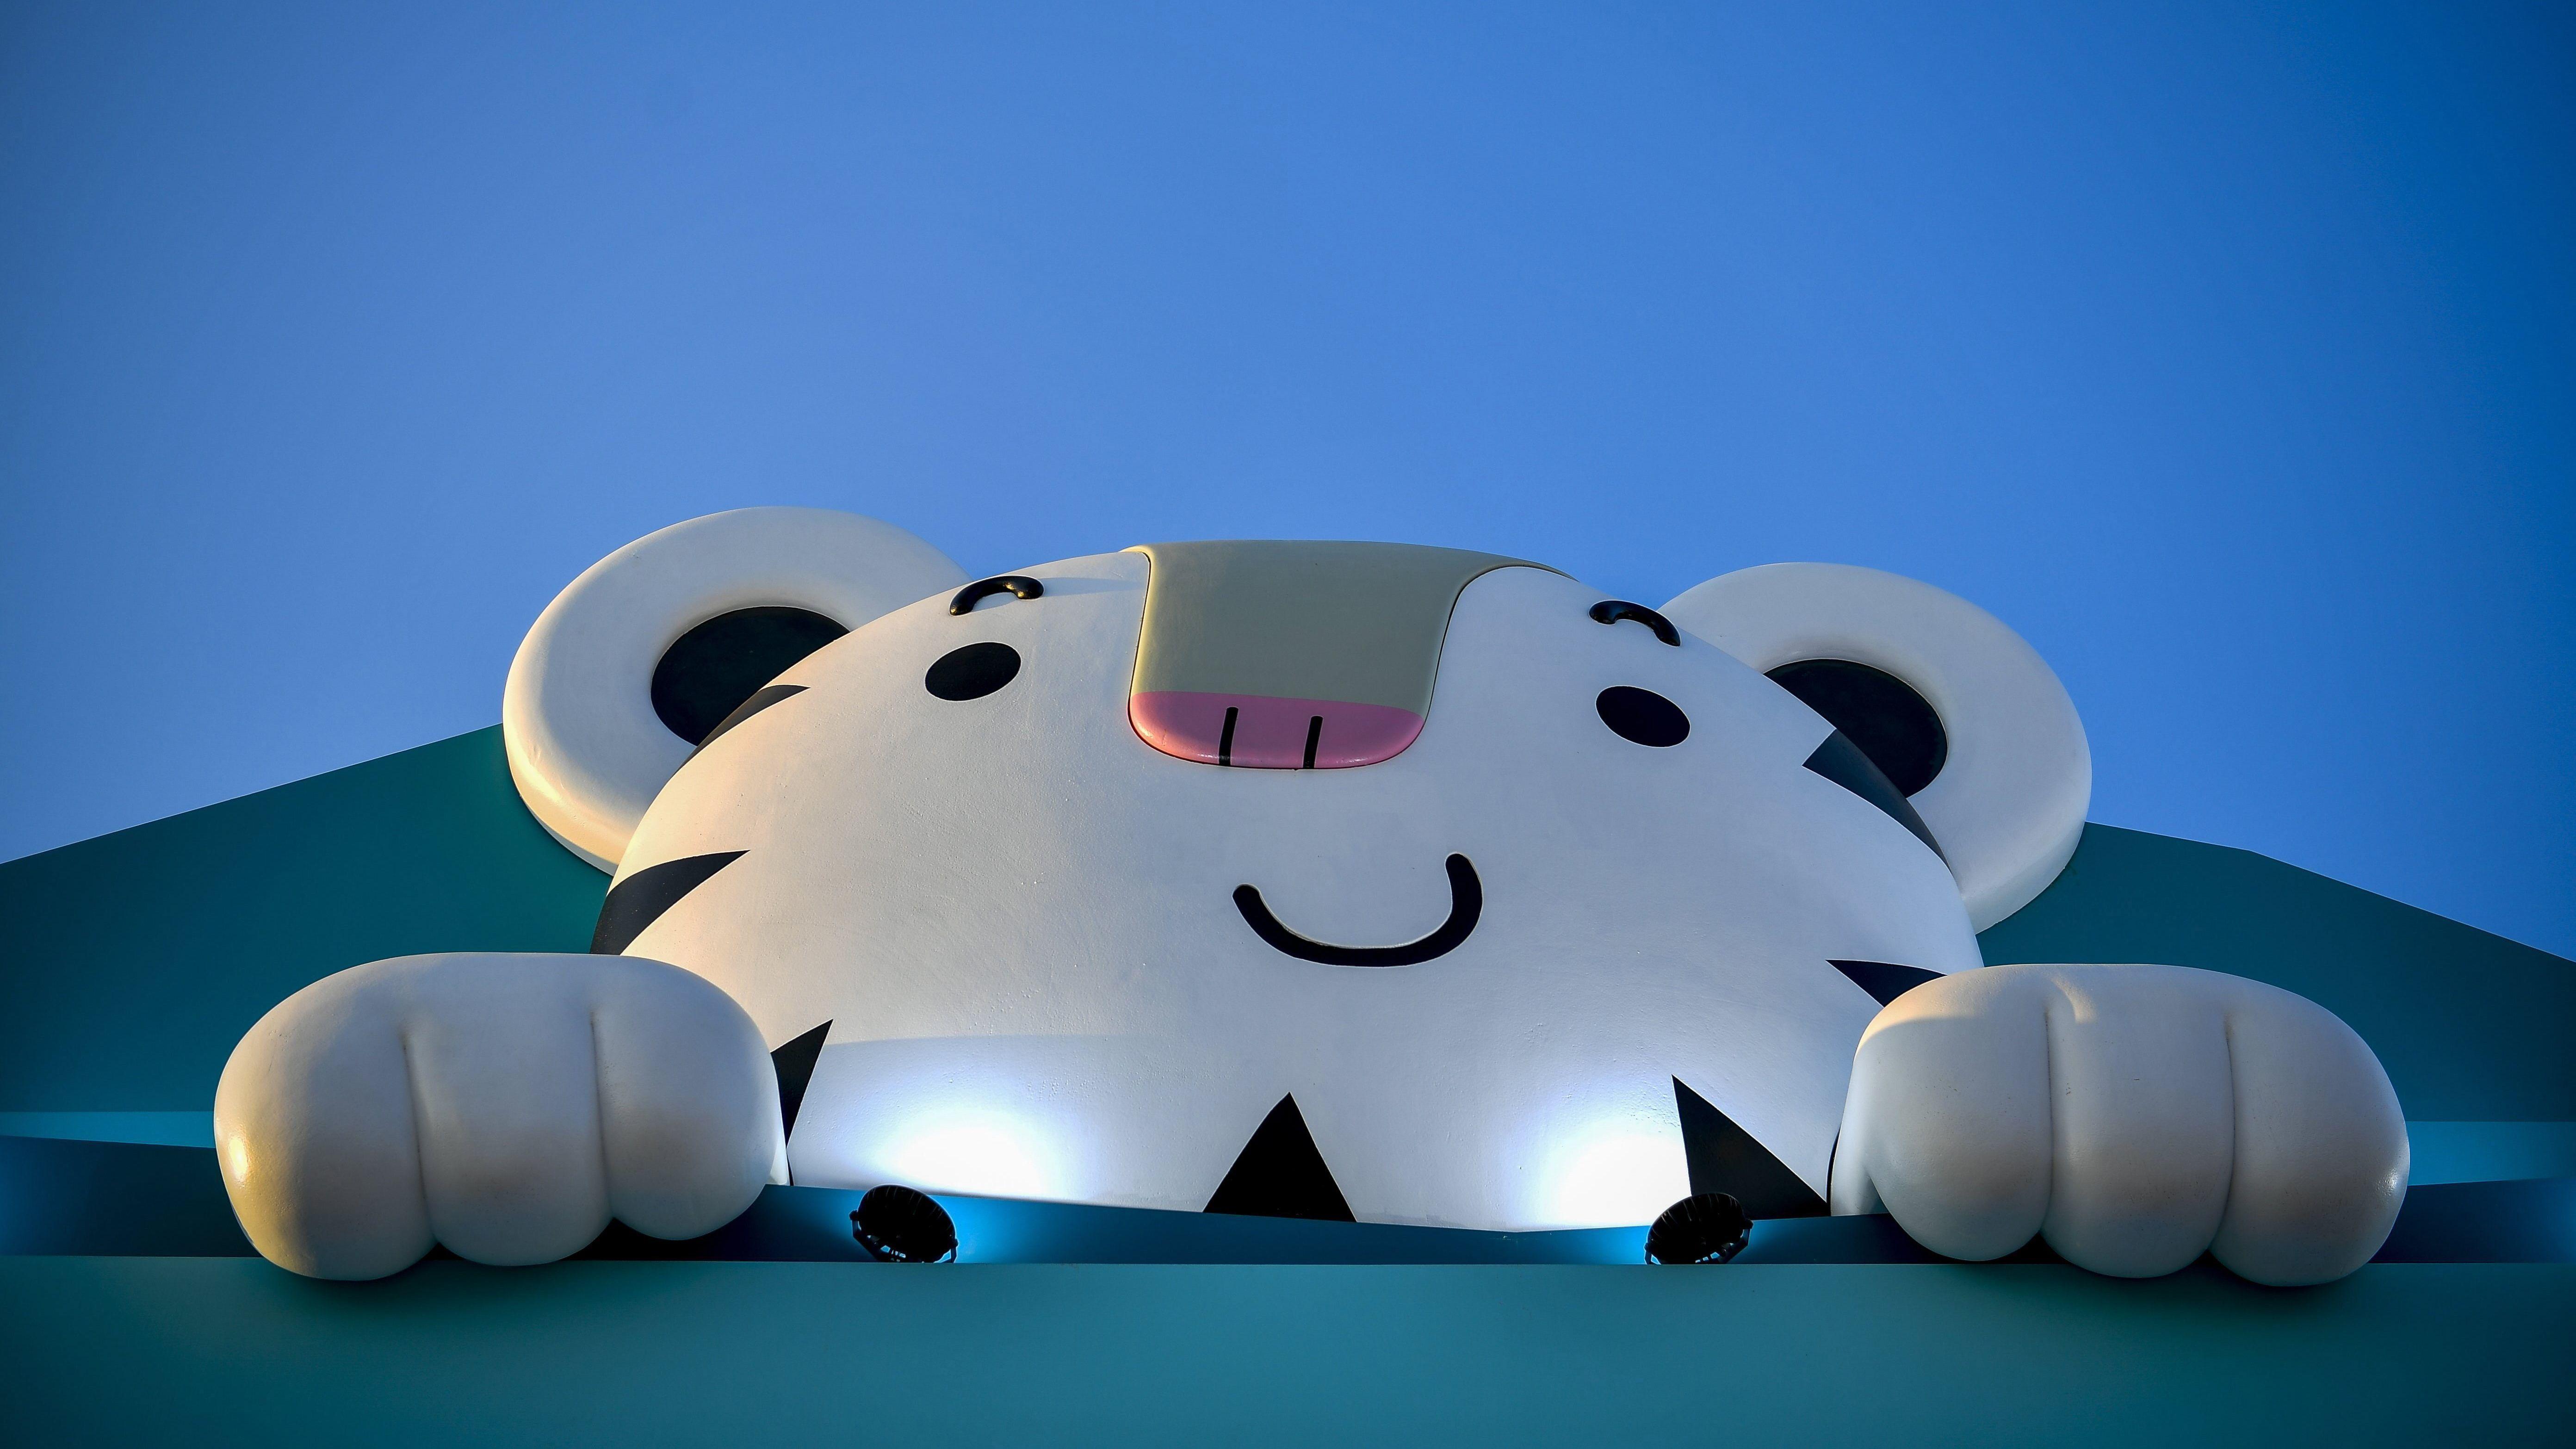 Leg-leg-leg formaruhák a phjongcshangi téli olimpia csapataitól · téli  olimpia 29c2bc3b5e